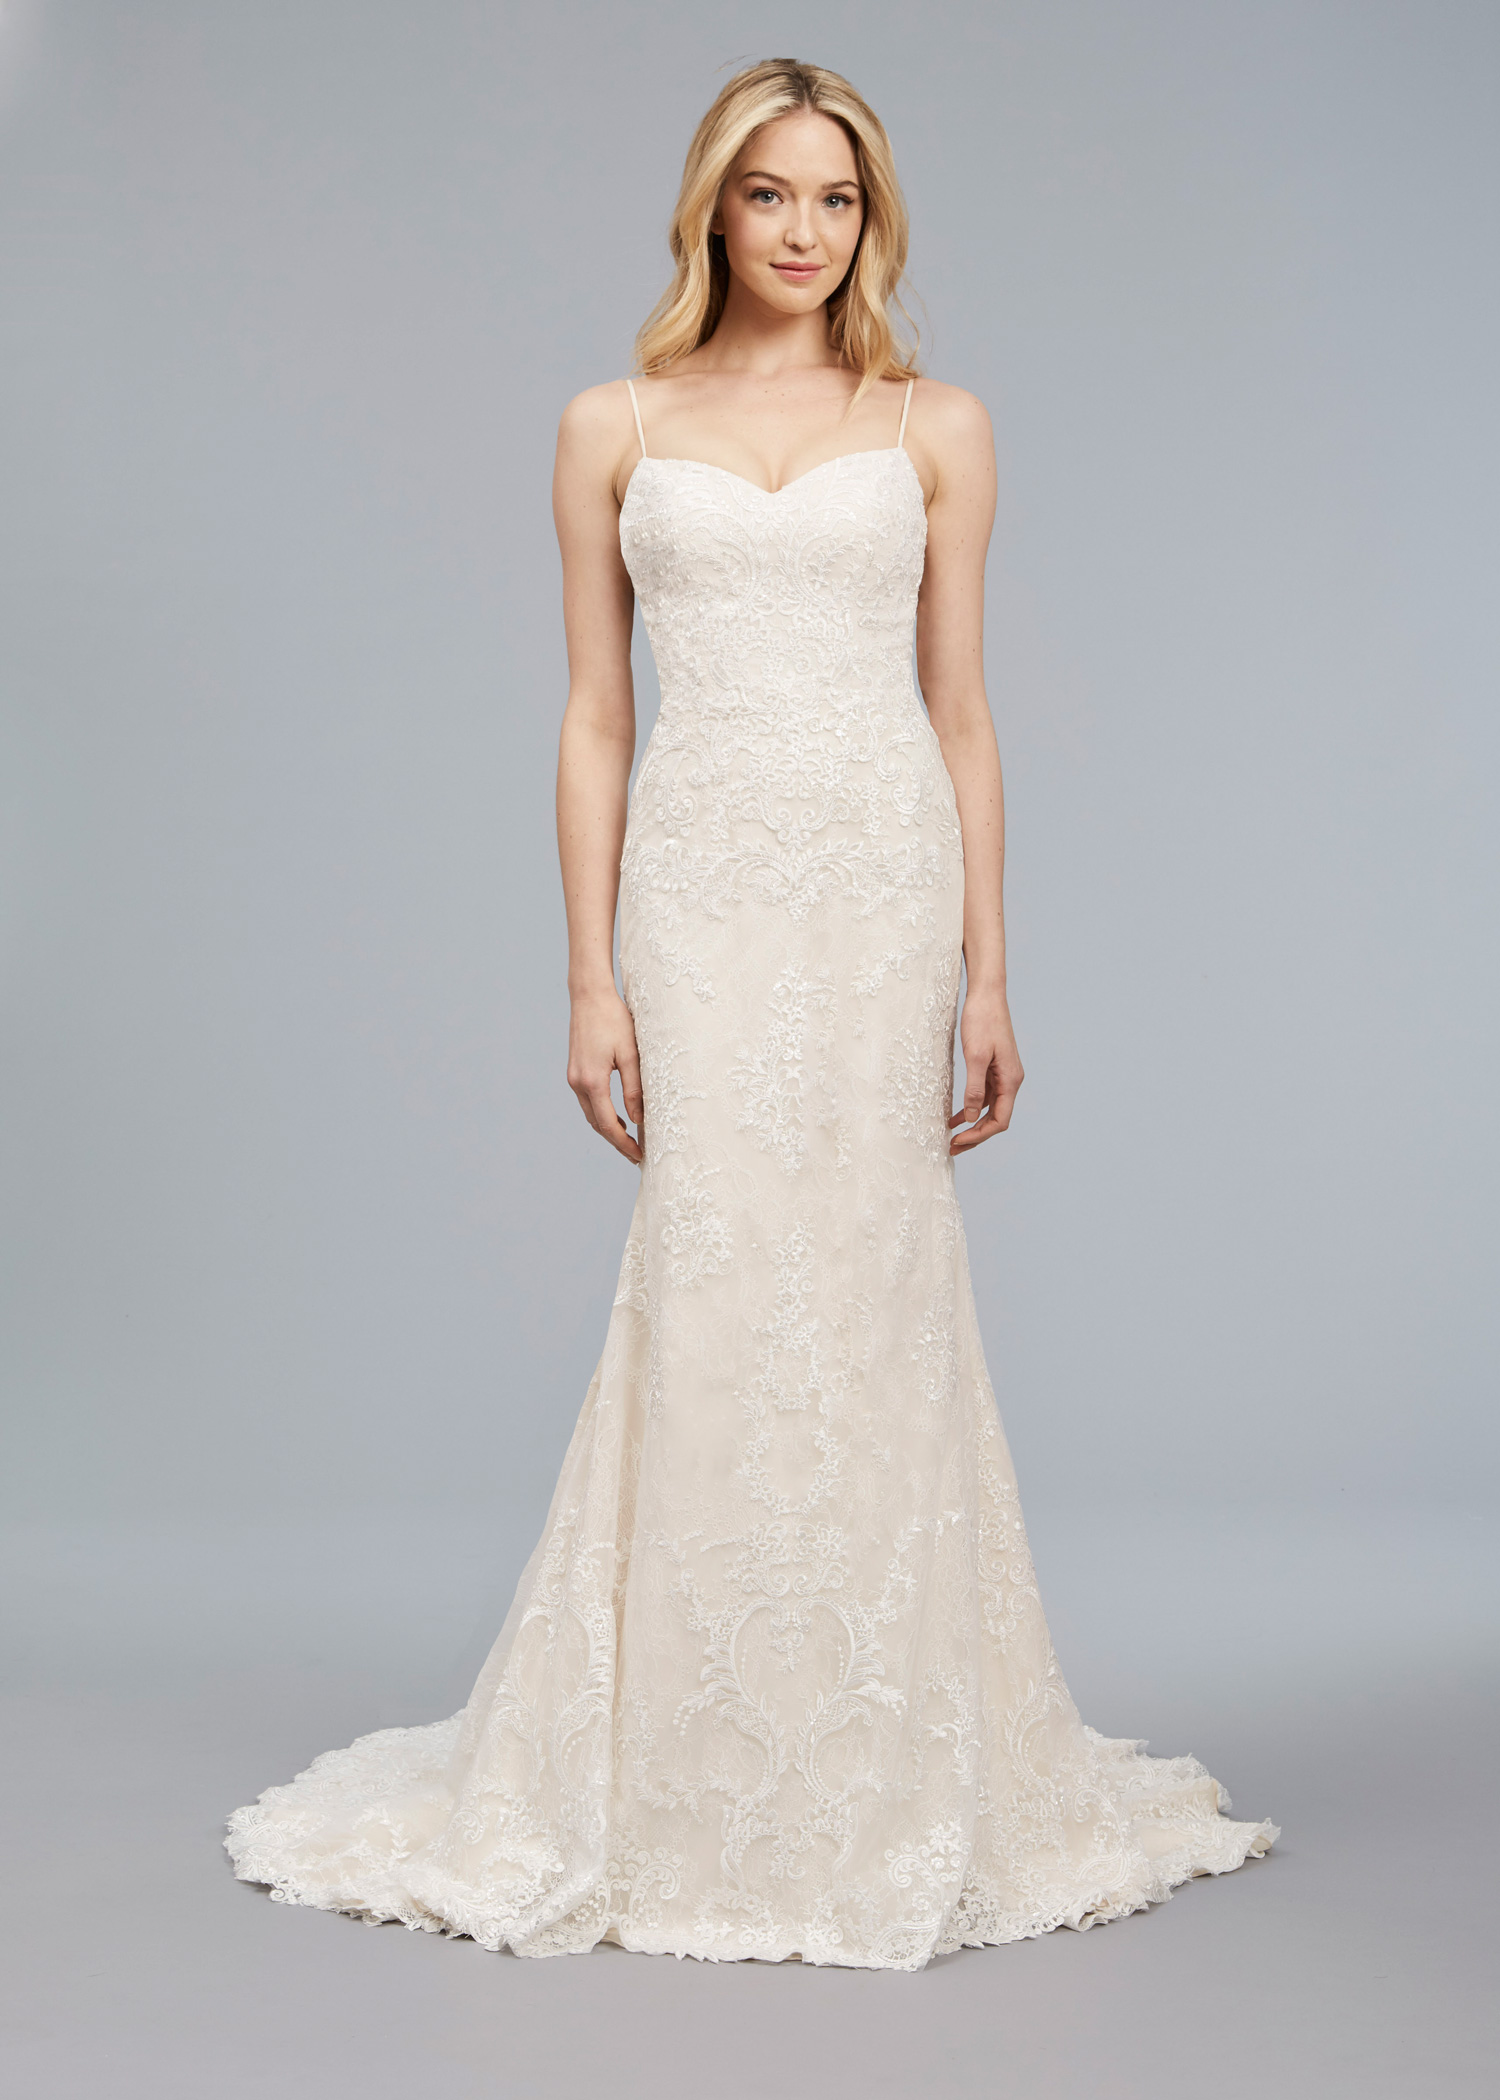 Anne Barge Blue Willow Bride Spring 2018 Luna - Inside Weddings